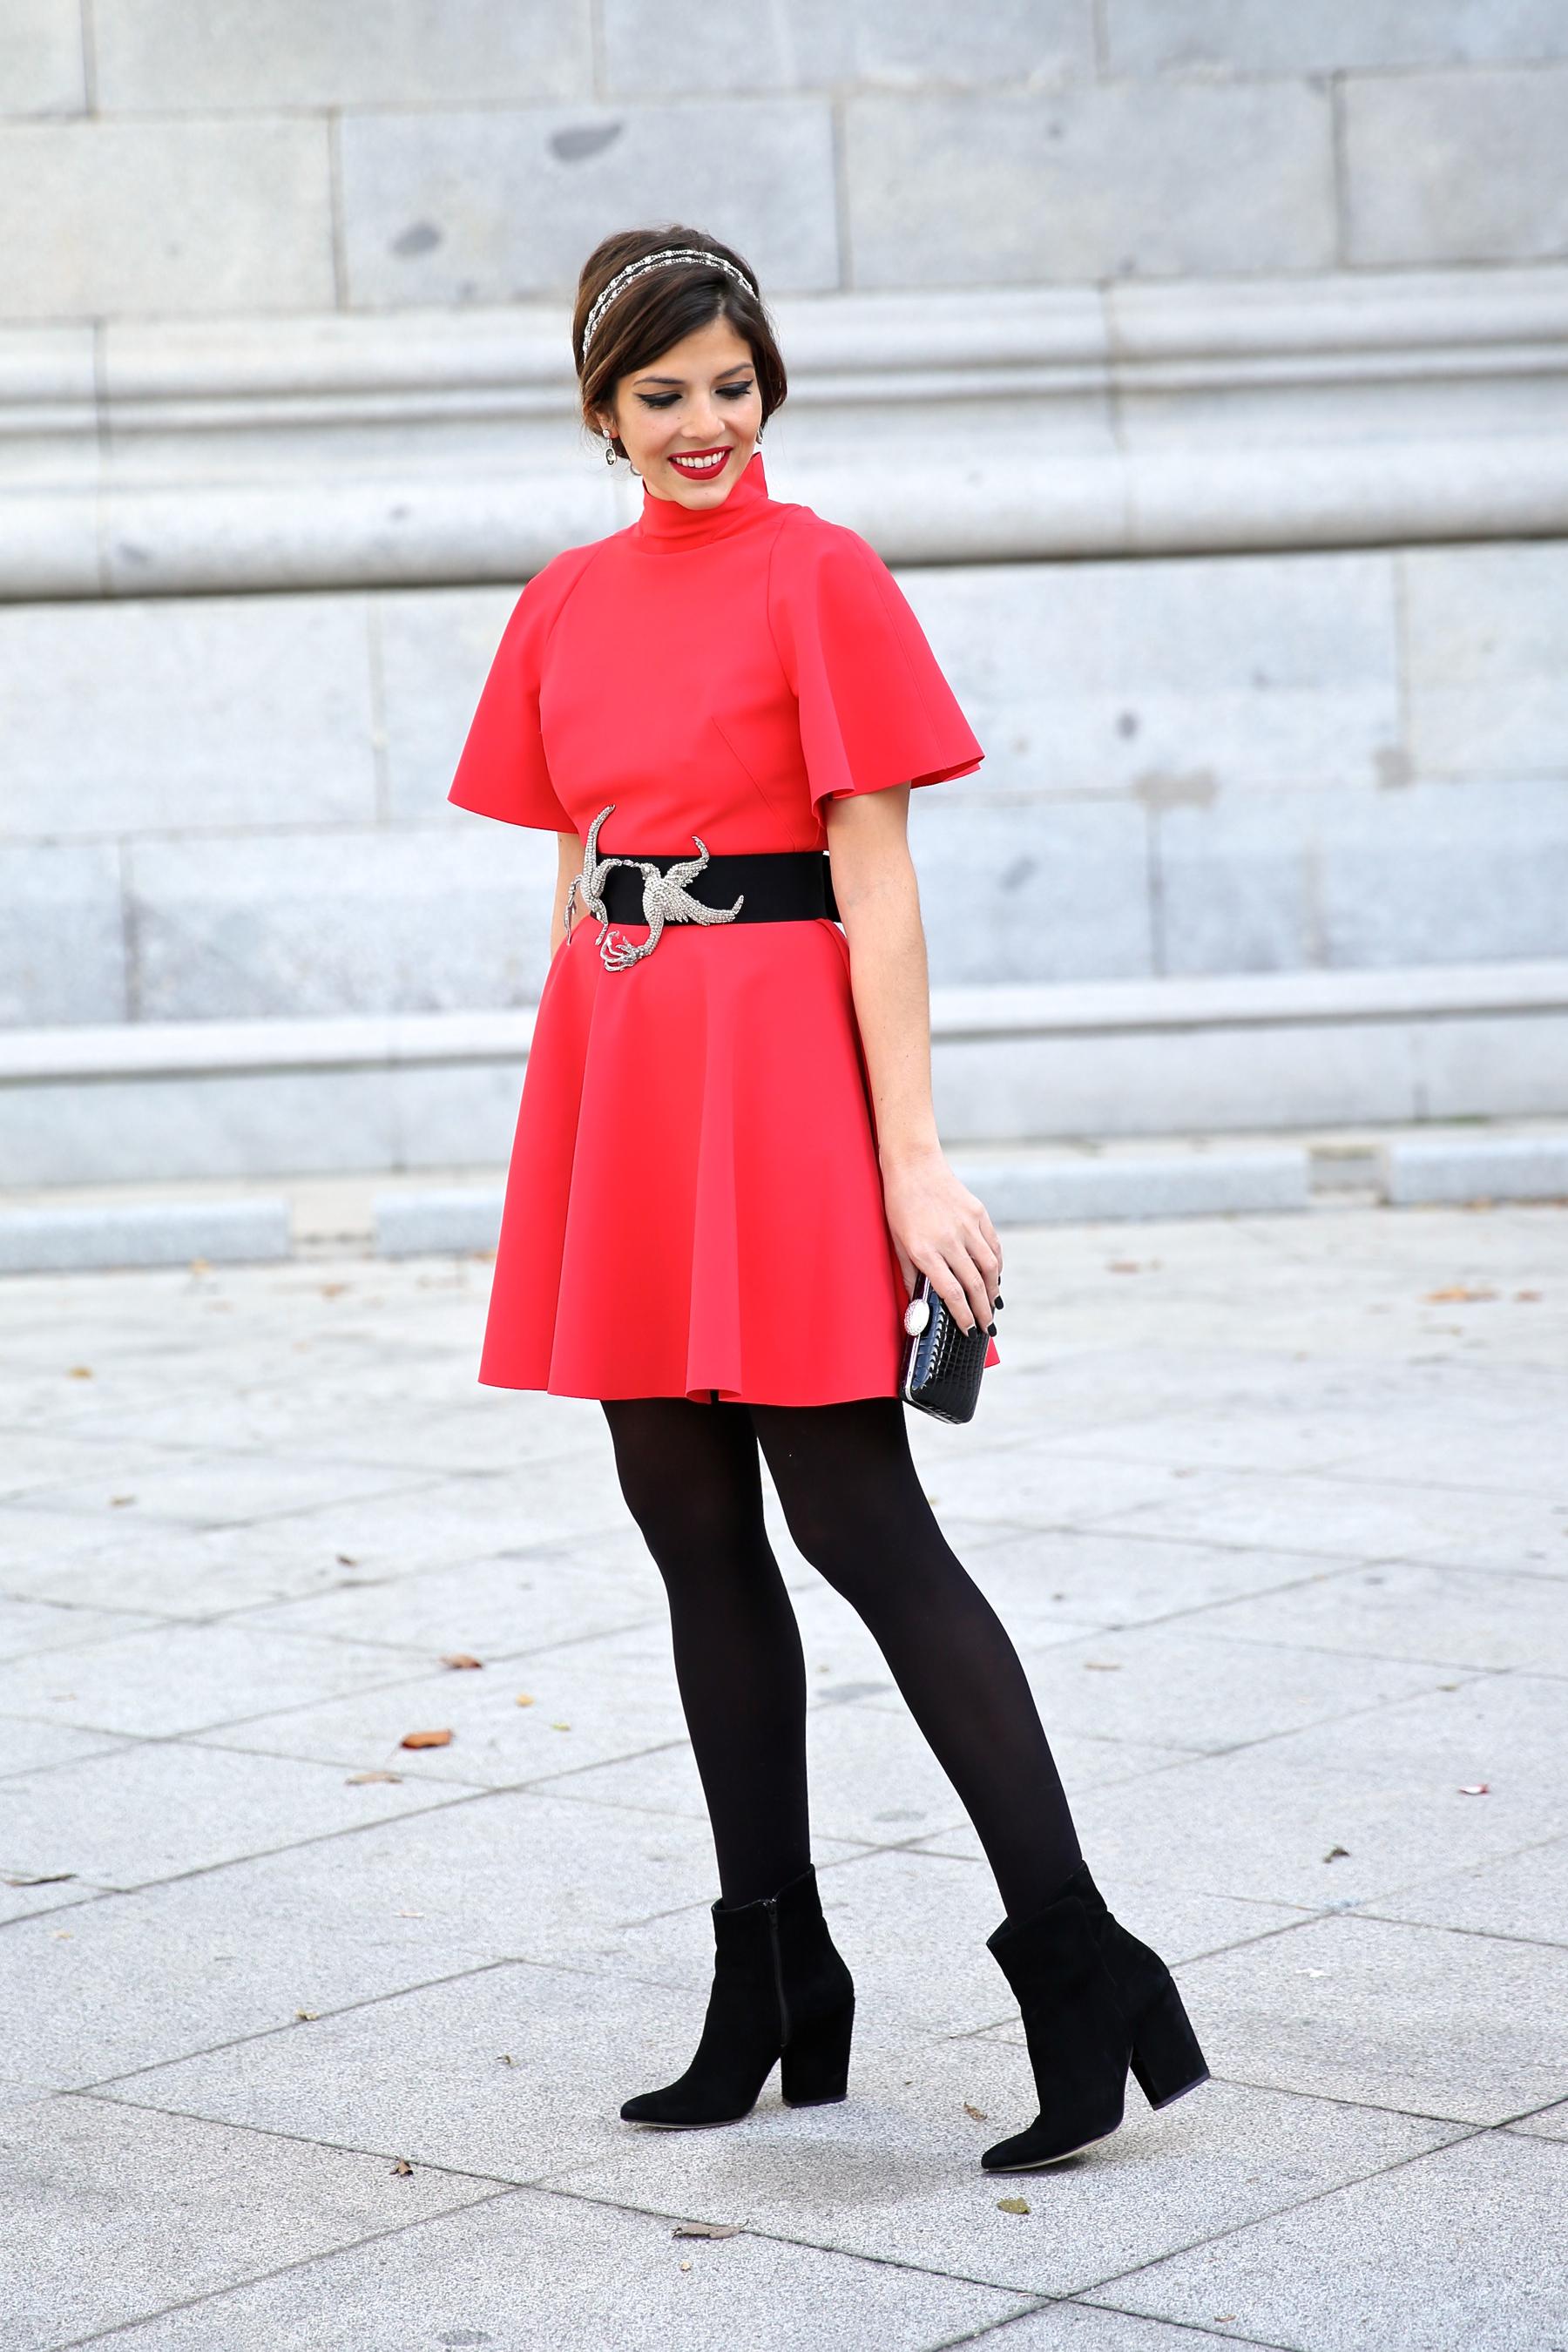 trendy_taste-look-outfit-street_style-ootd-blog-blogger-fashion_spain-moda_españa-vestido_fiesta-24fab-15